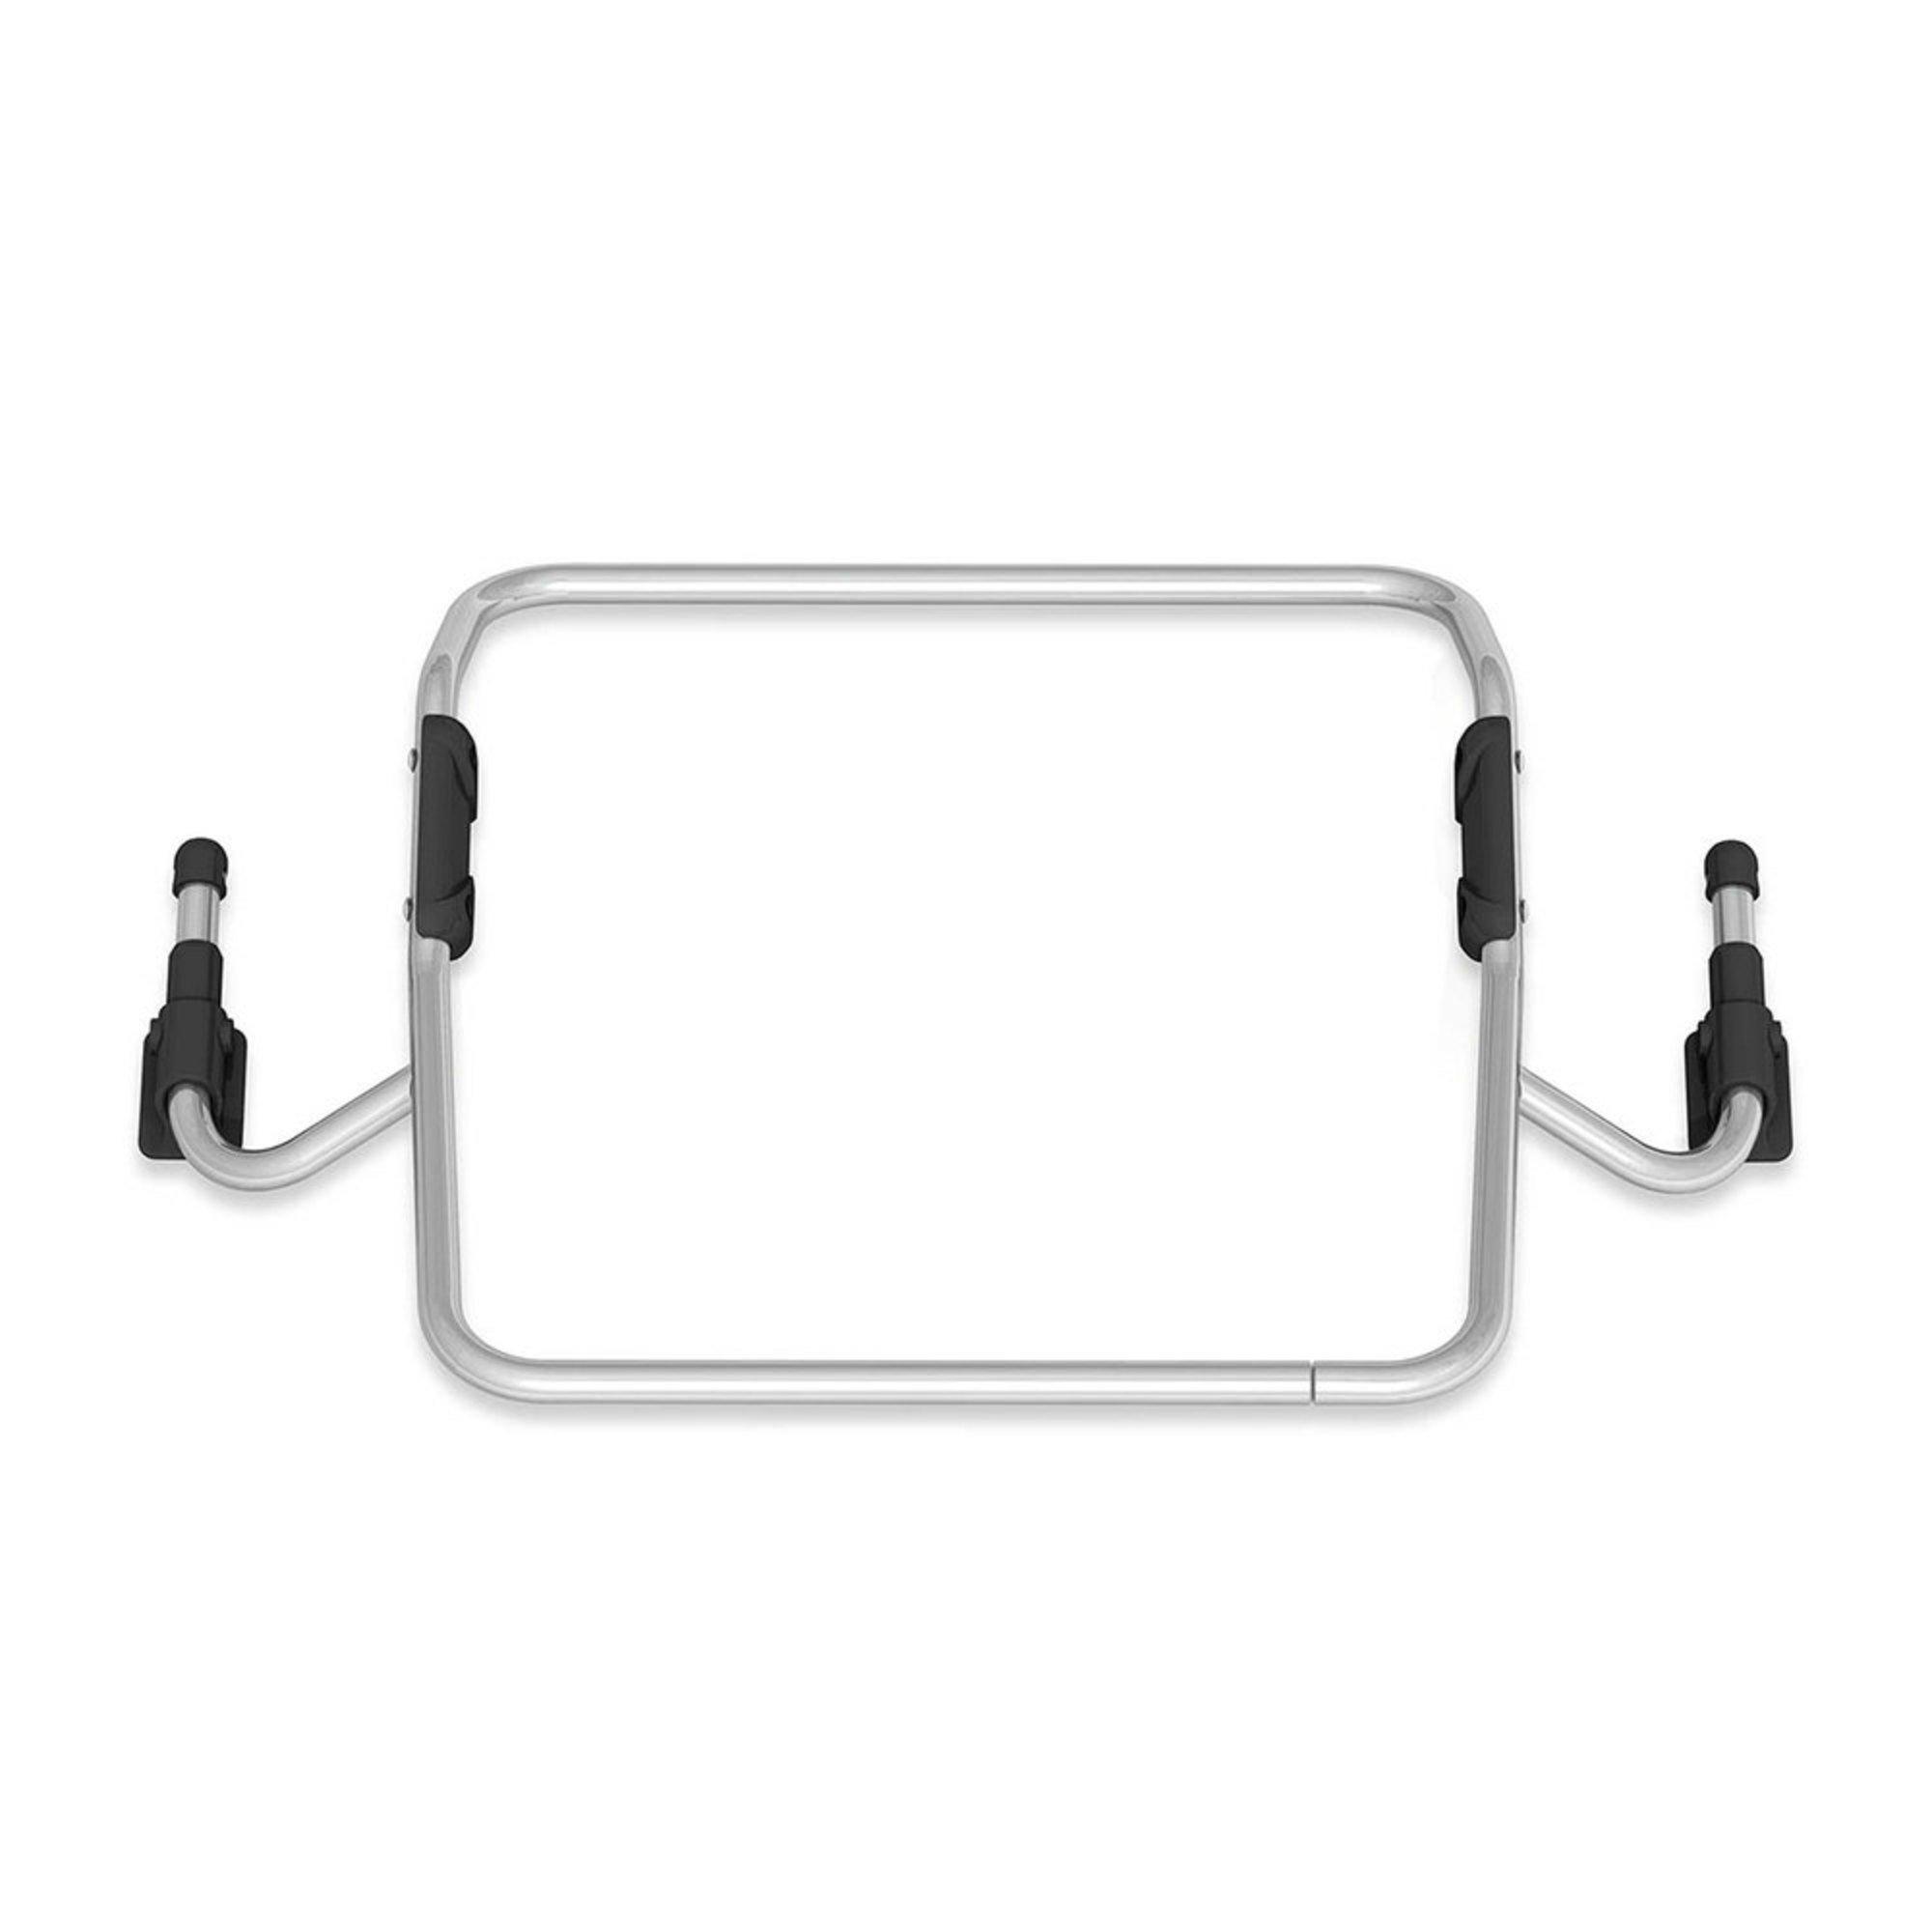 britax bob infant car seat adaptor chicco stroller accessories kids shop your navy. Black Bedroom Furniture Sets. Home Design Ideas